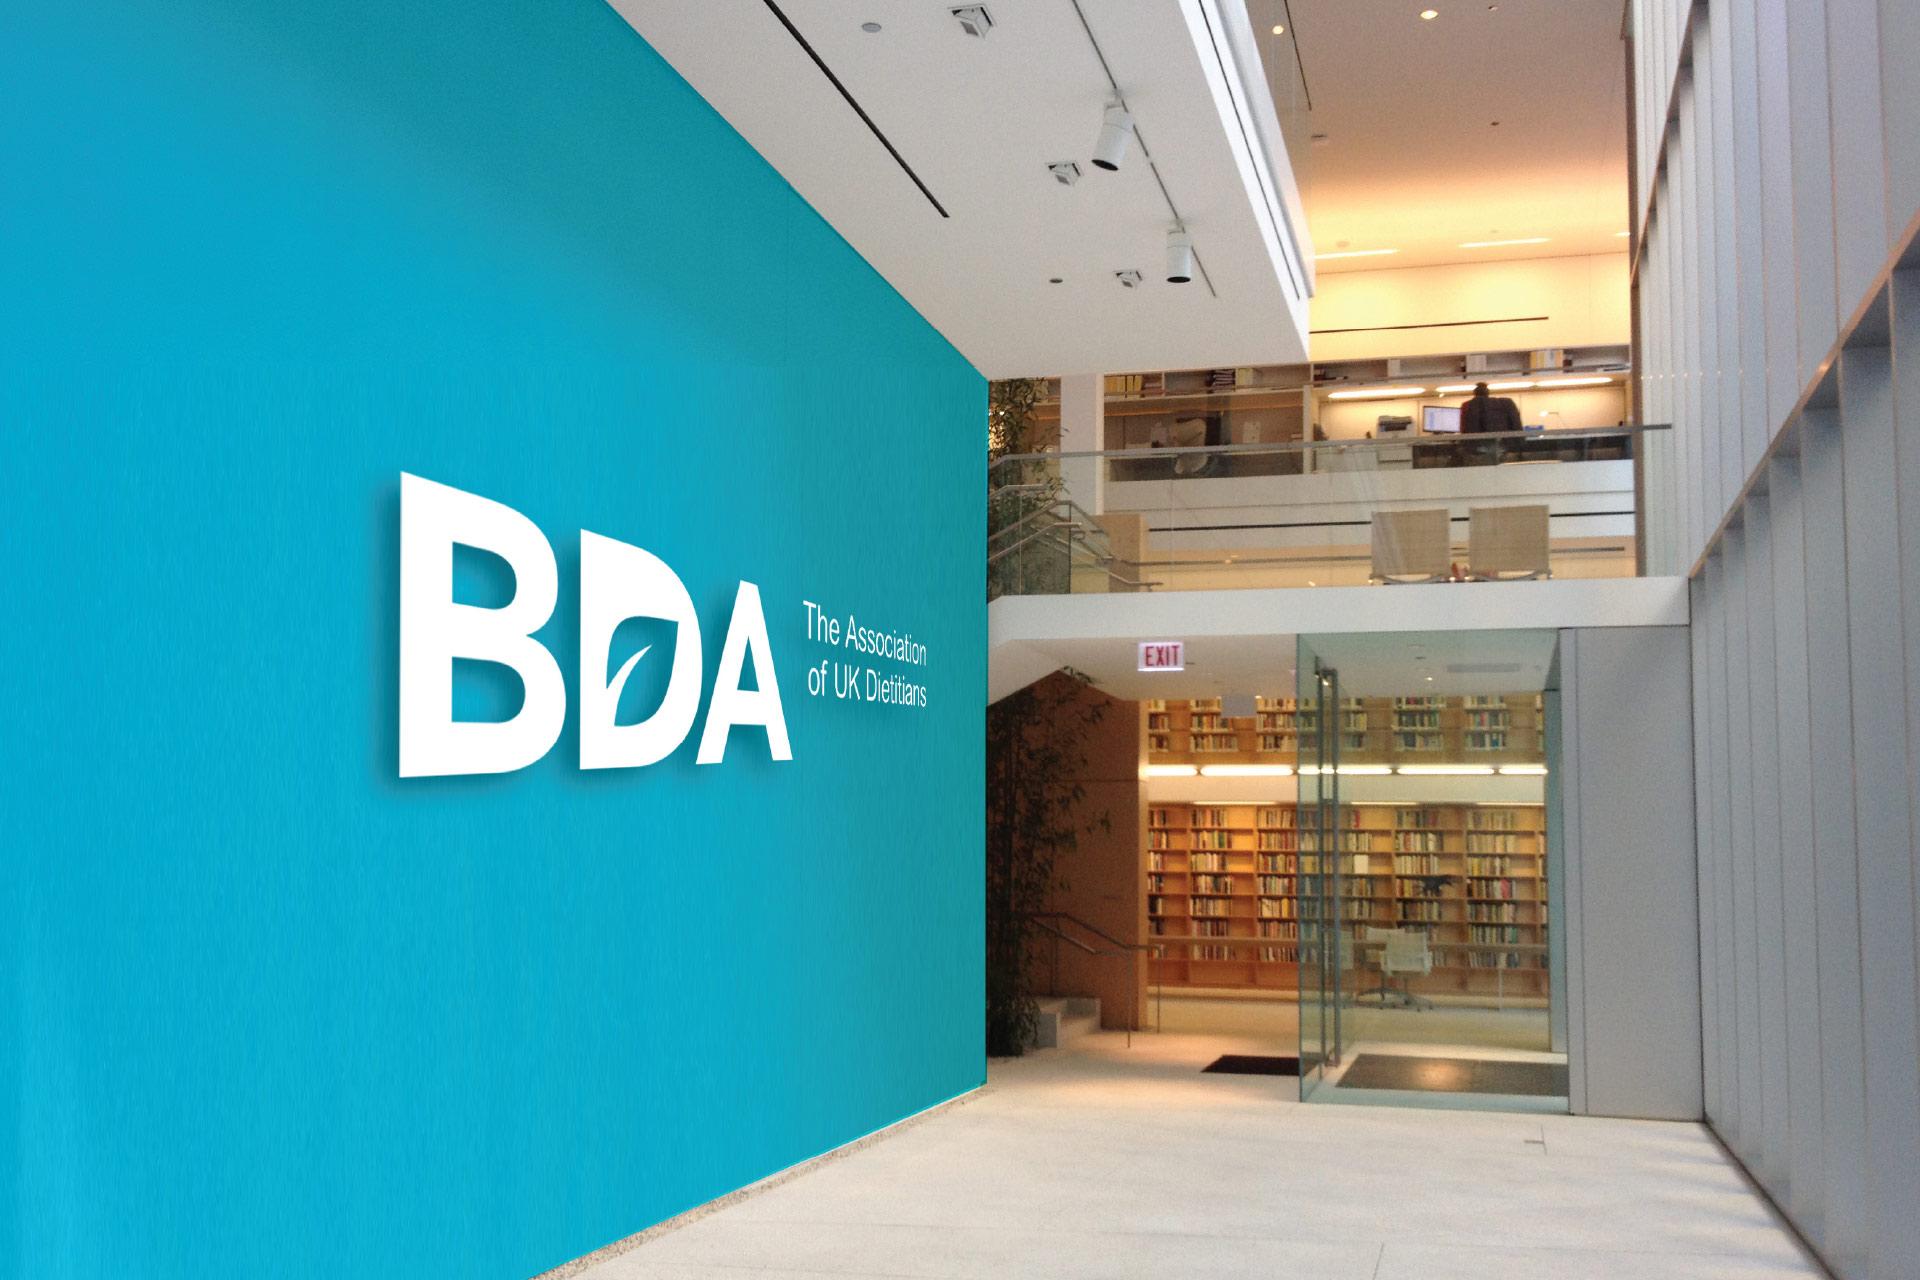 British Dietetic Association Identity Design By Antony